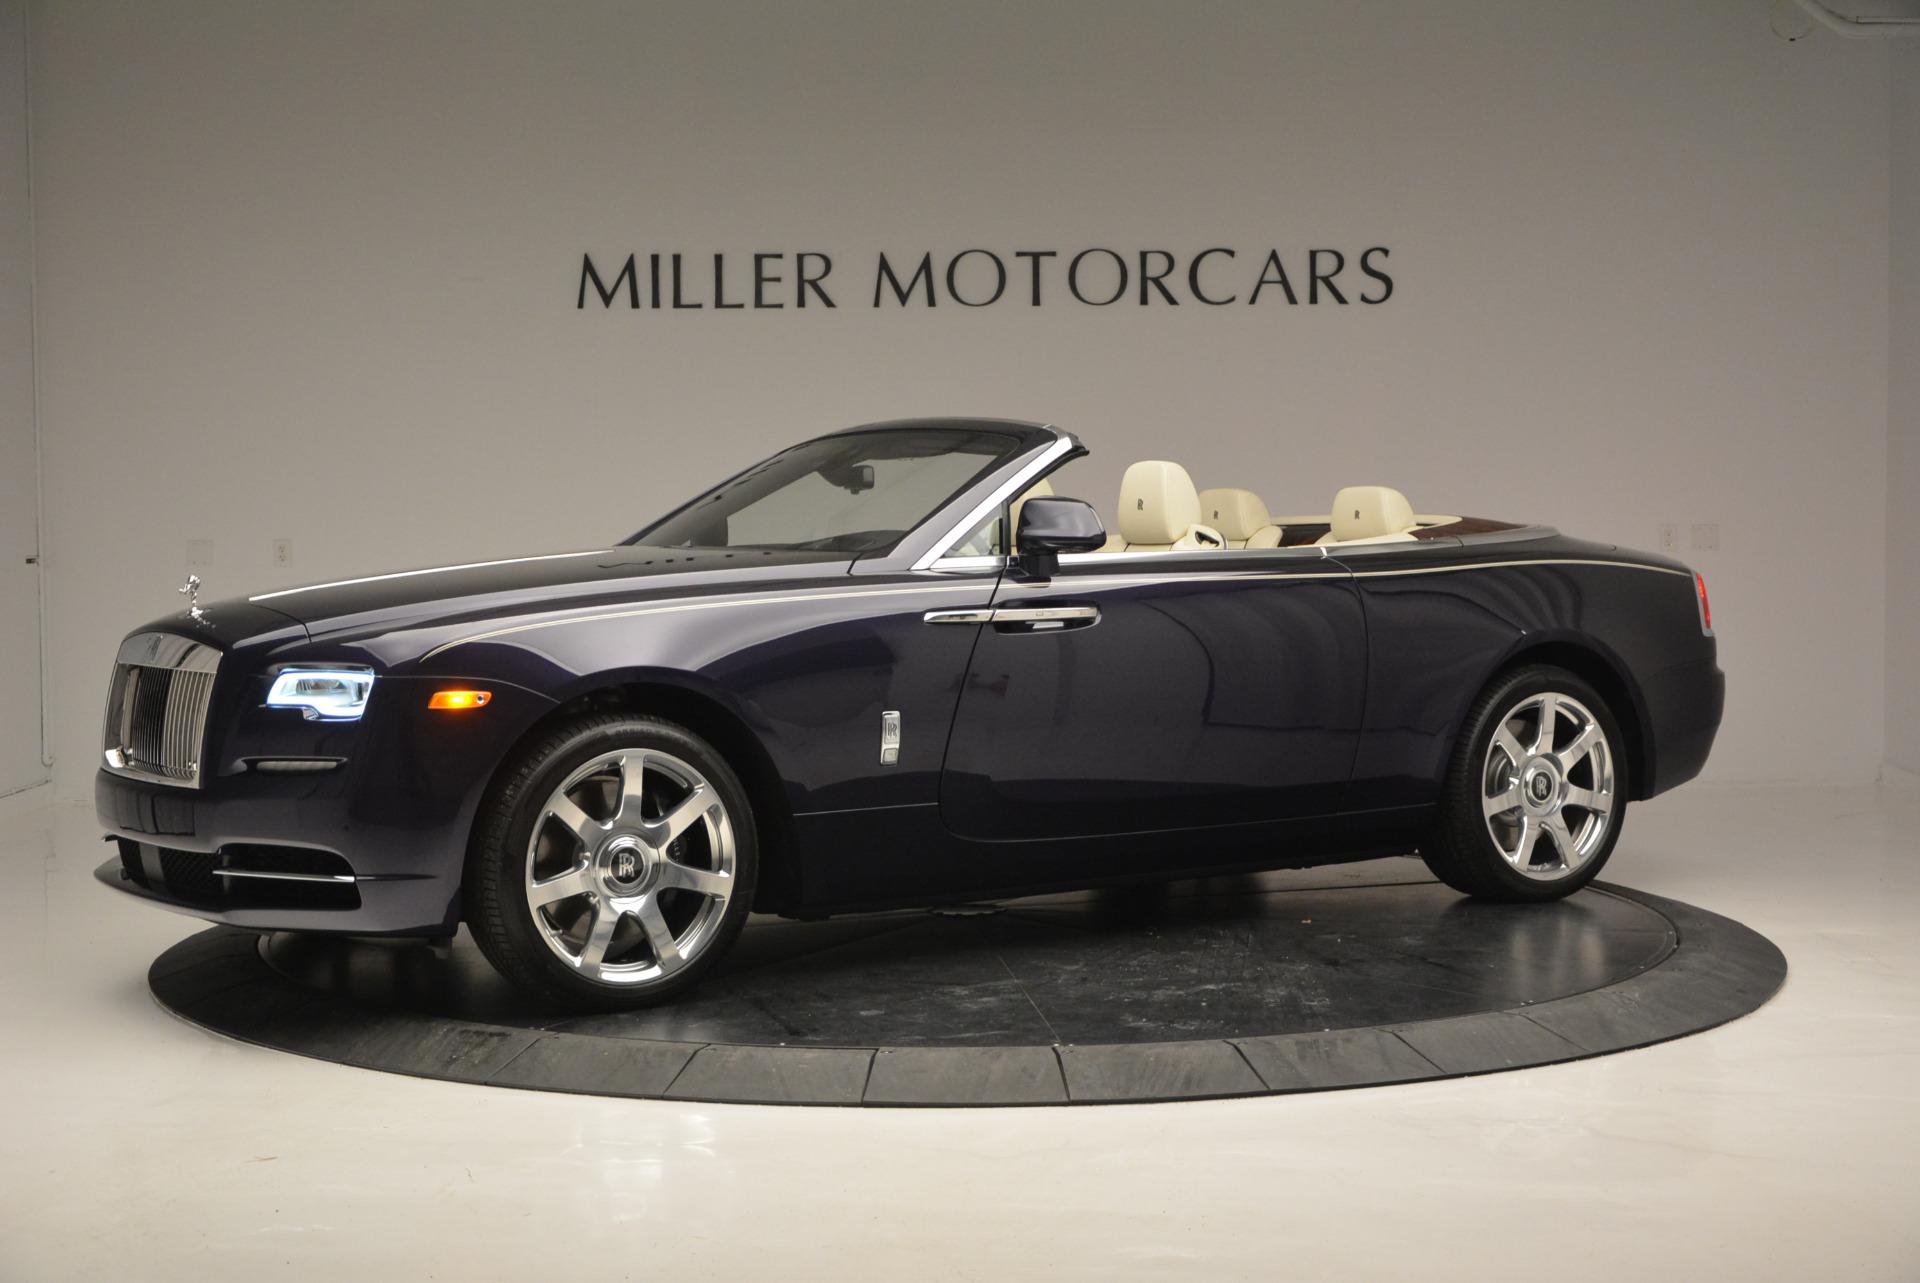 New 2016 Rolls-Royce Dawn  For Sale In Greenwich, CT 704_p4